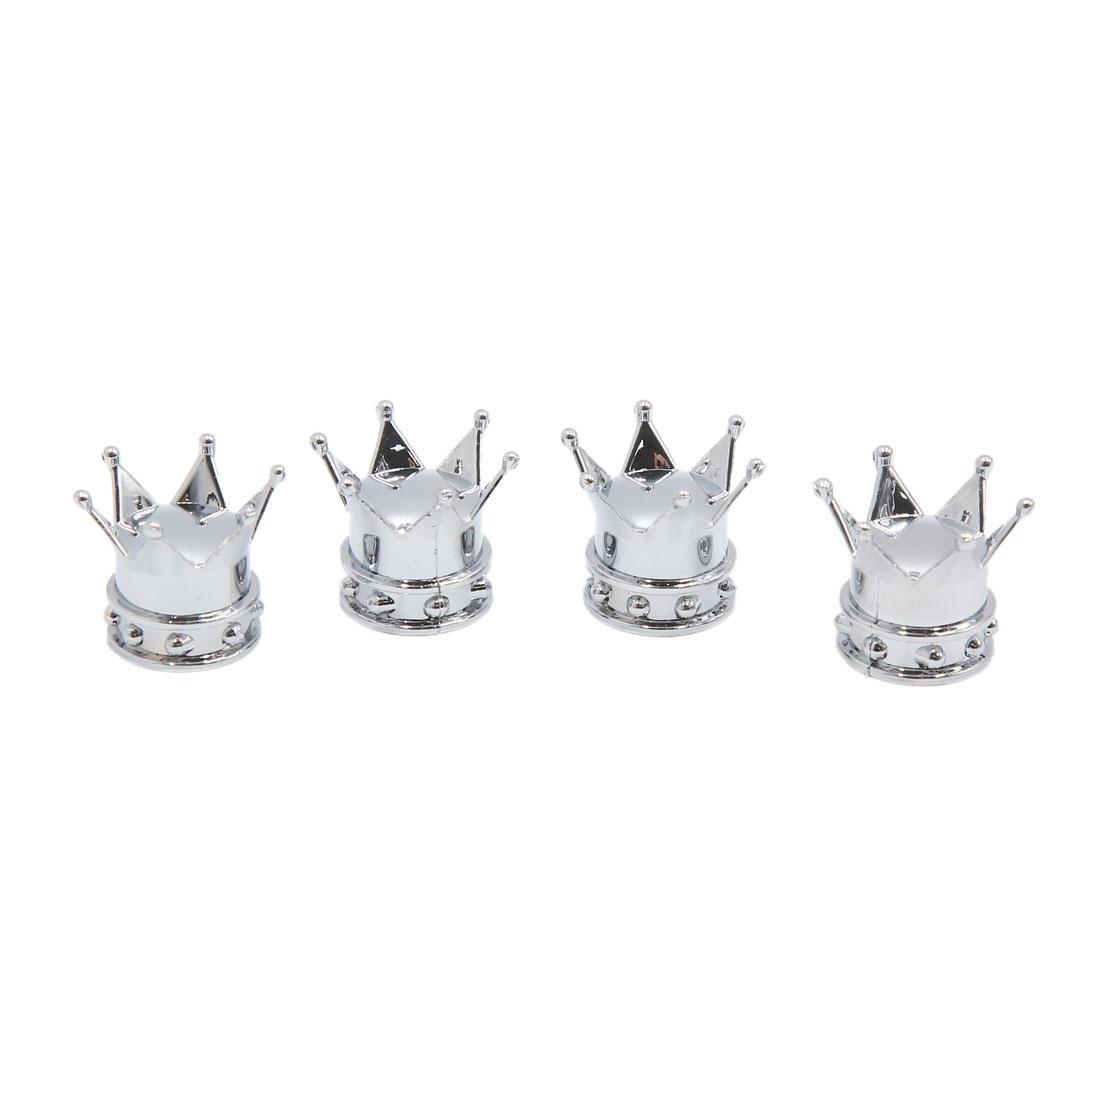 4pcs Silver Tone Crown Shaped Car Tire Tyre Valve Stem Protective Cap Cover